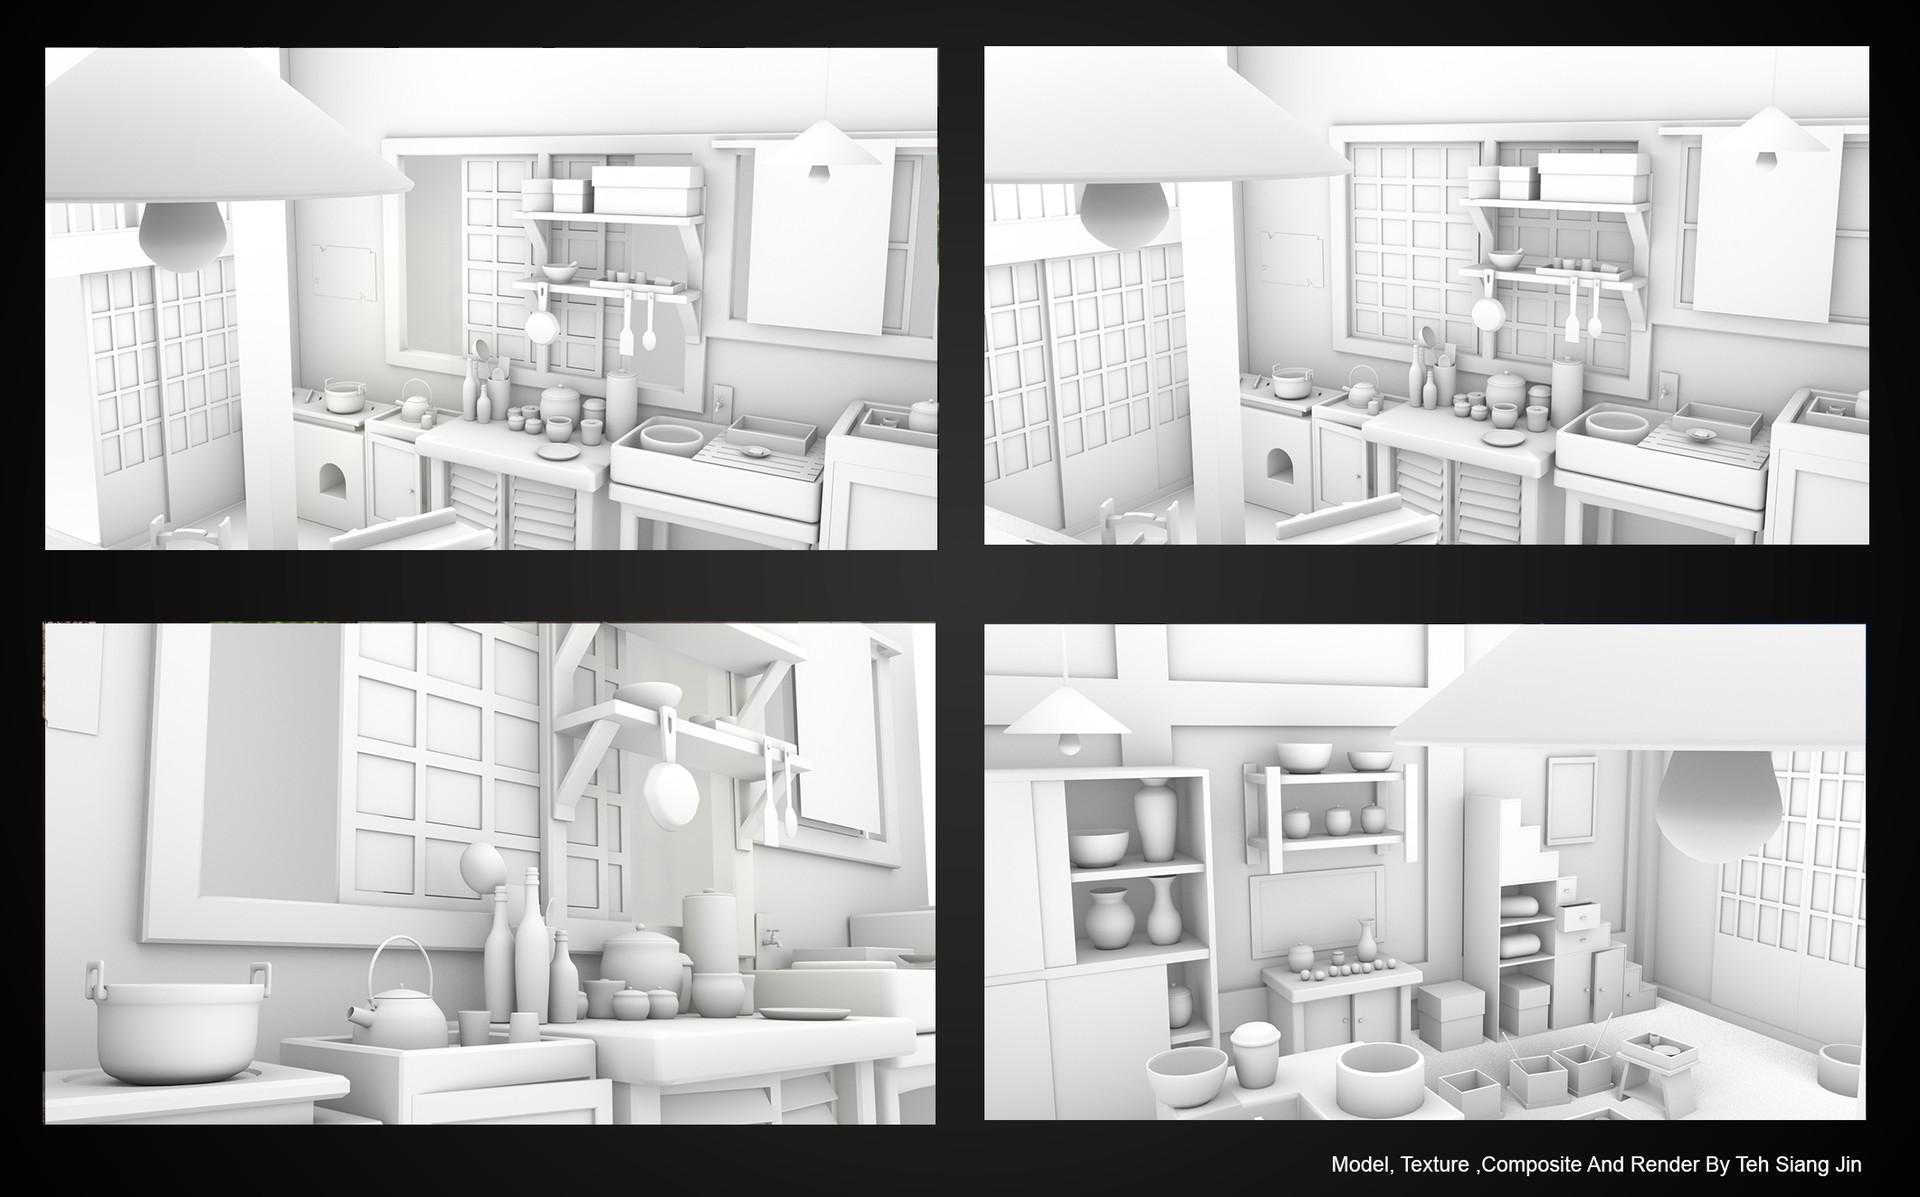 Siang Jin - 3D Modeling _ Japanese Kitchen Environment